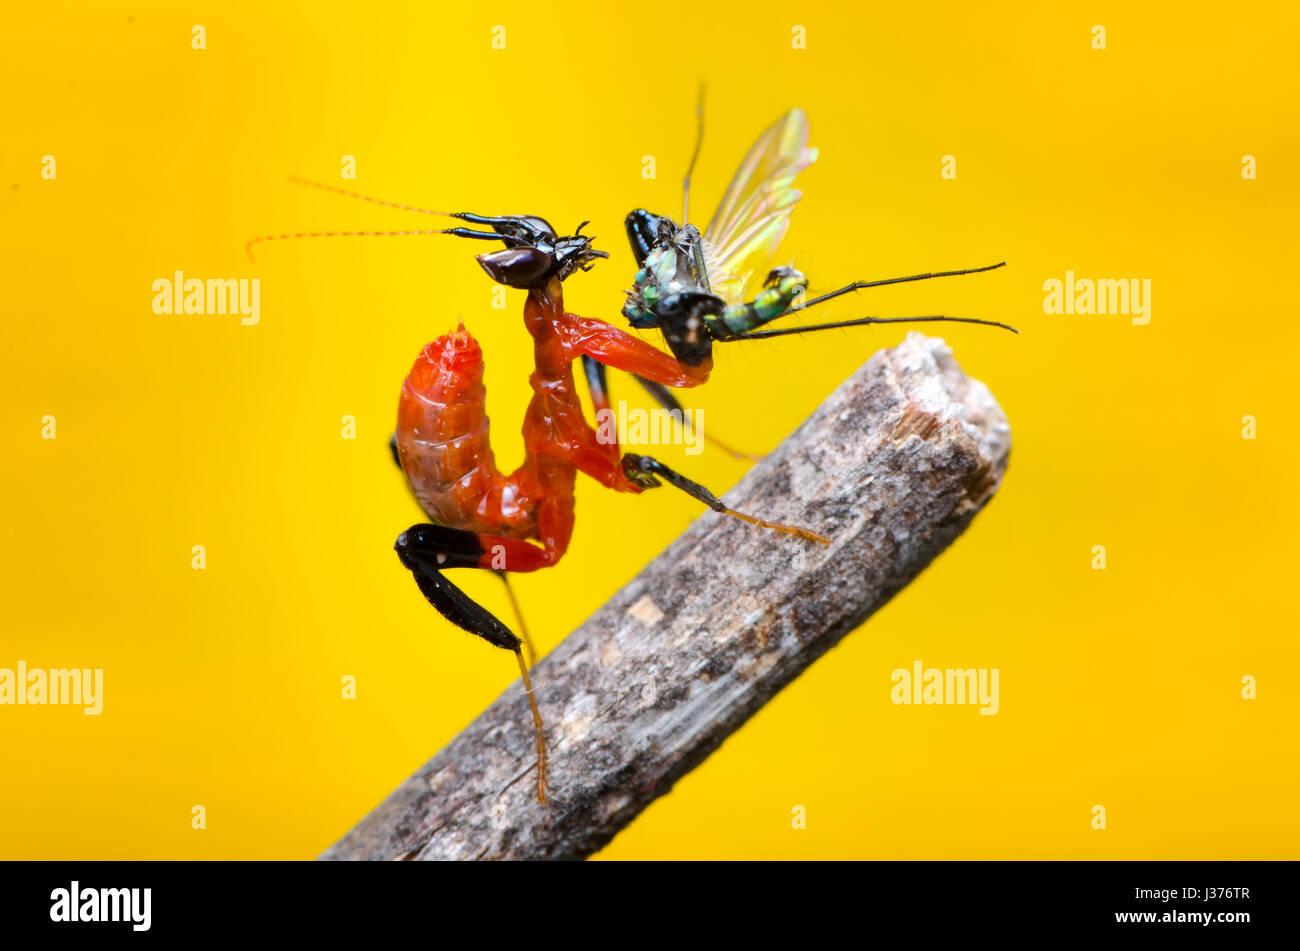 orchid mantis level 1 nymph. feeding on long leg fly. praying mantis, Hymenopus coronatus. - Stock Image